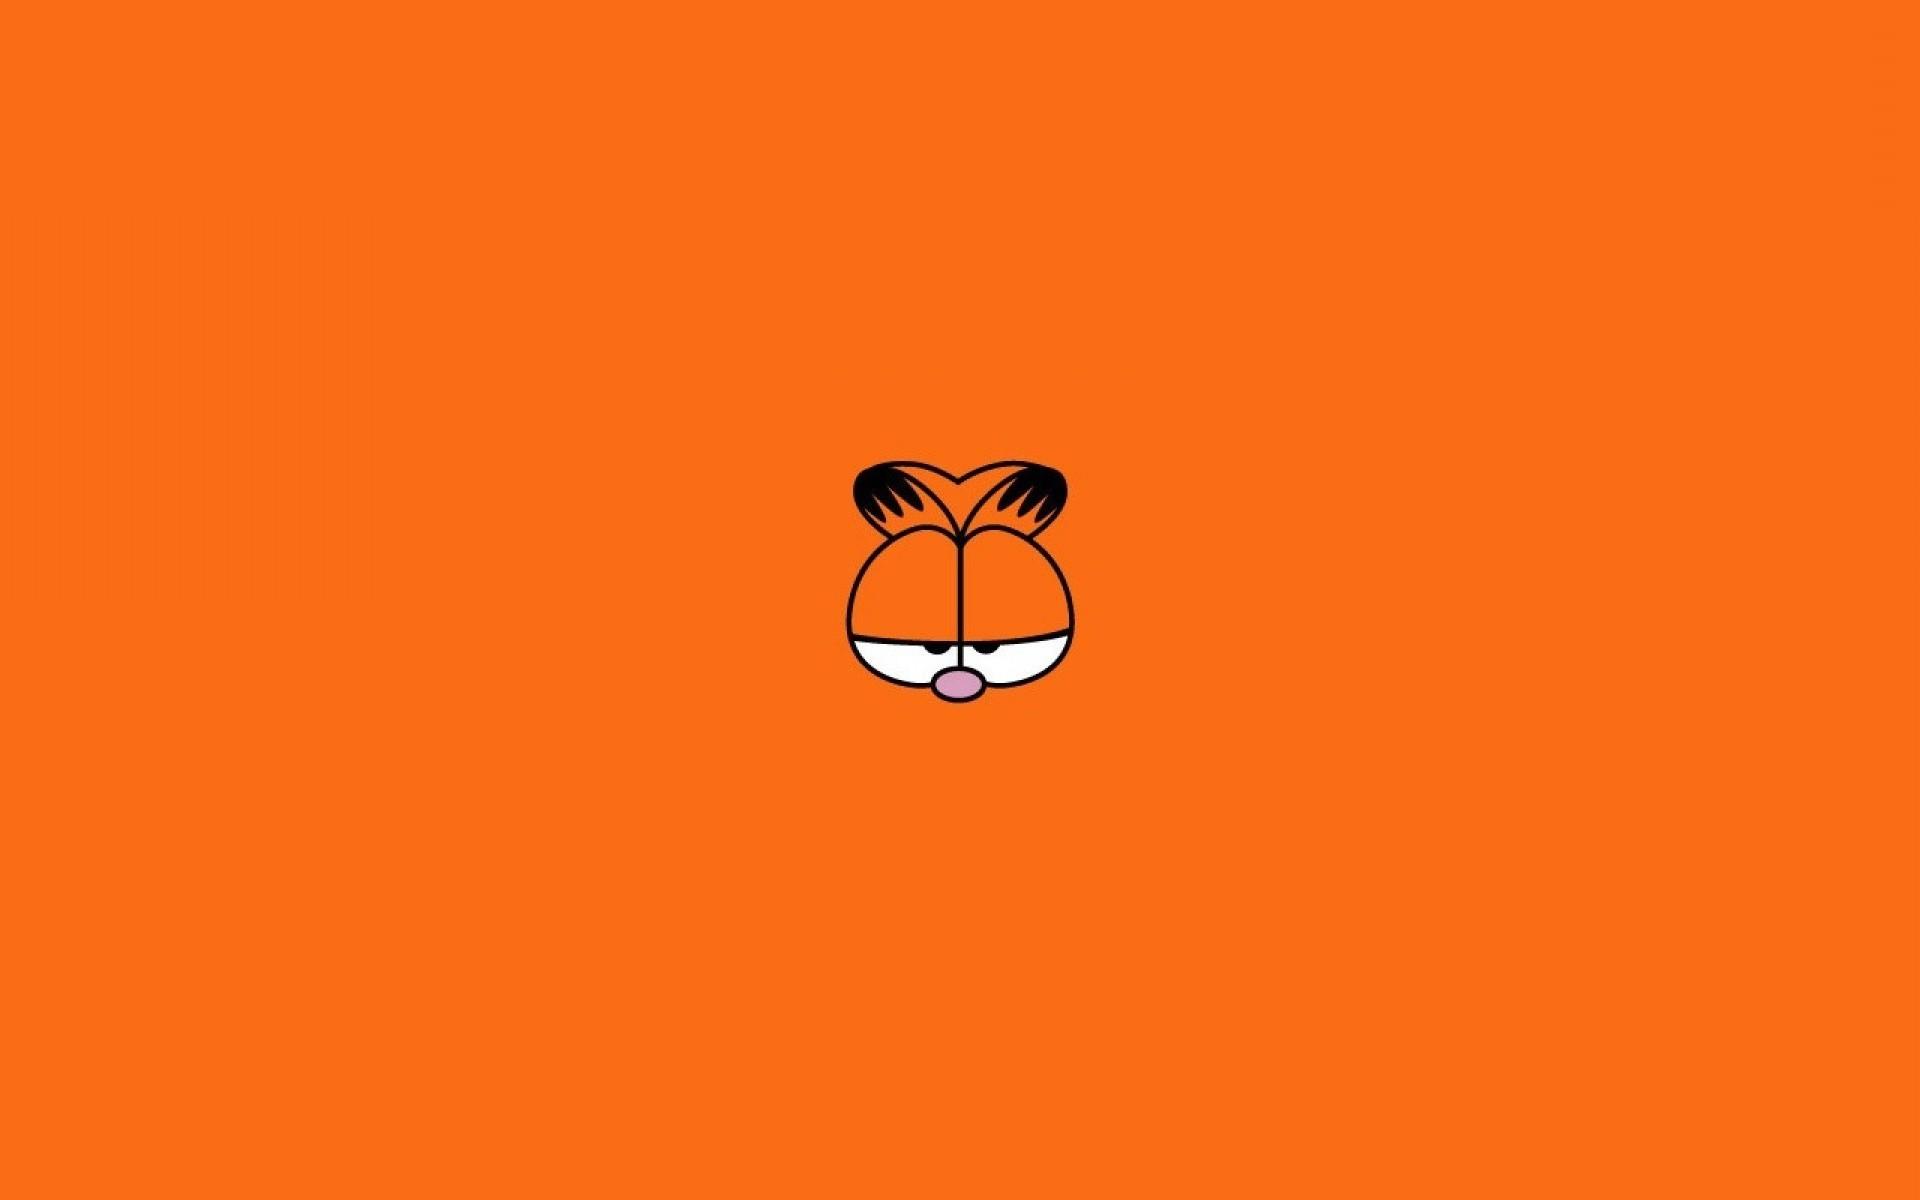 Cute Silly Wallpapers Eyes Garfield Minimalism Cat Orange Wallpapers Hd